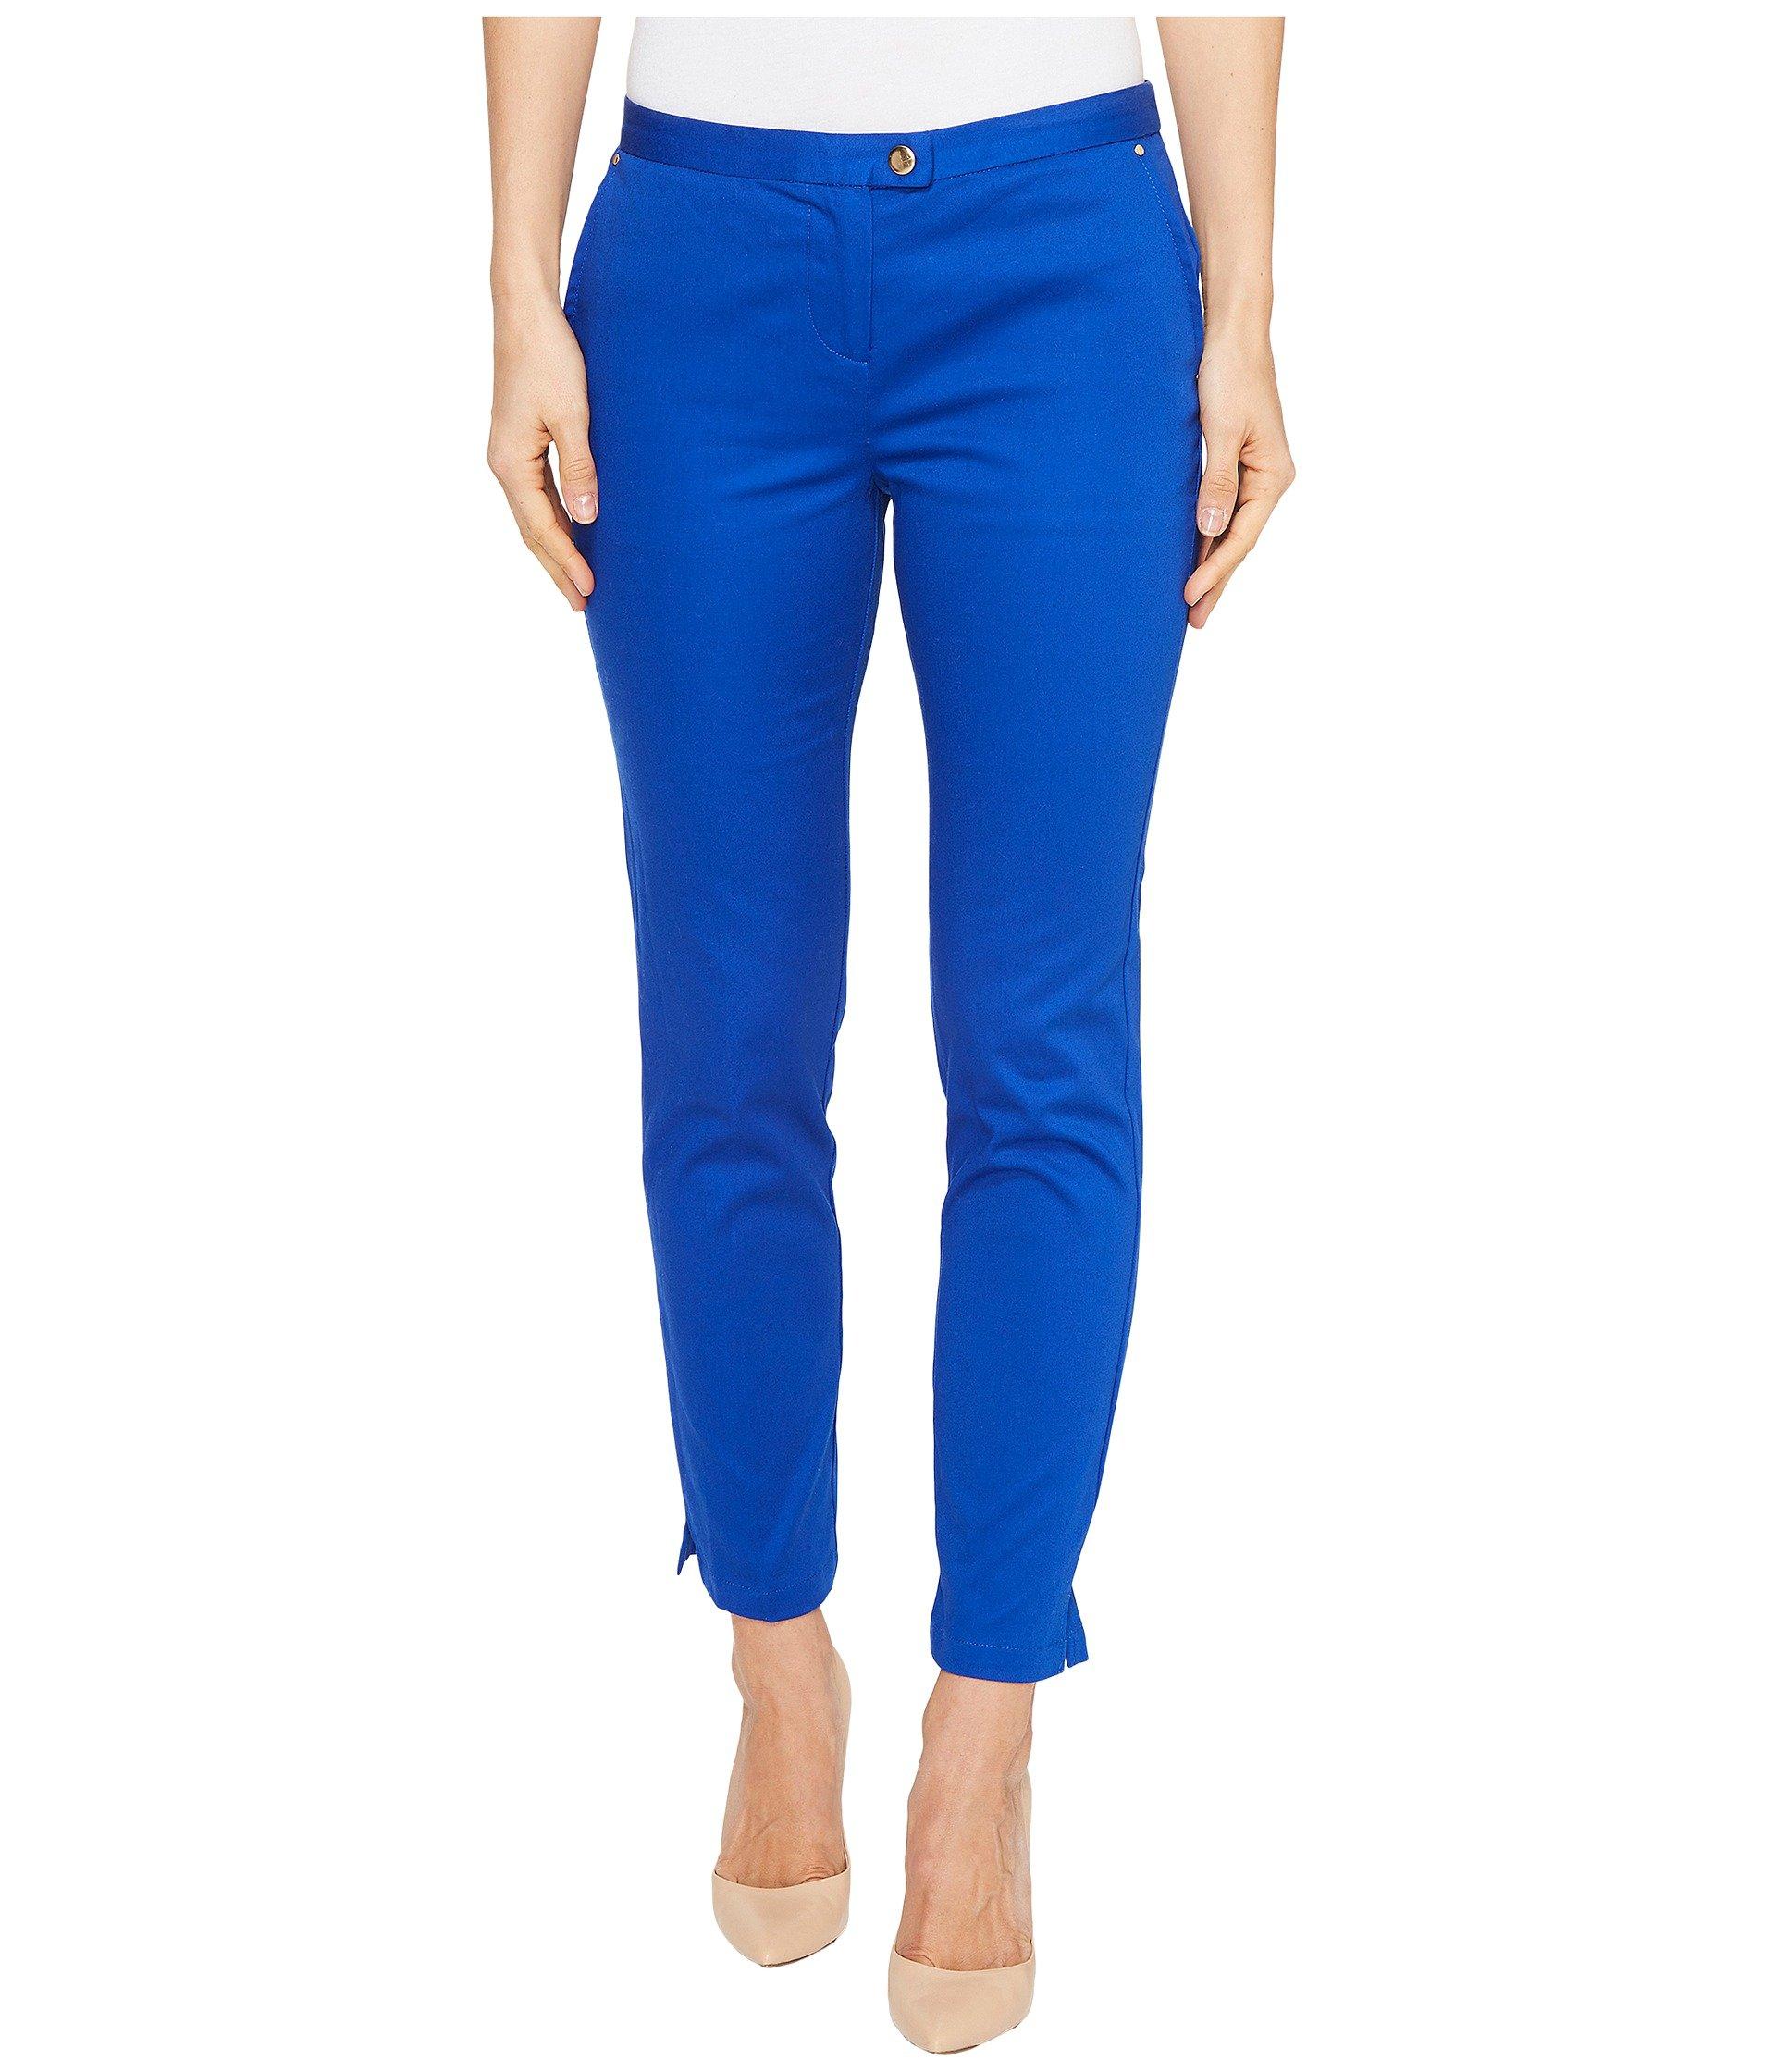 Pantalón para Mujer XOXO Natalie Cropped Side Slit Pants  + XOXO en VeoyCompro.net